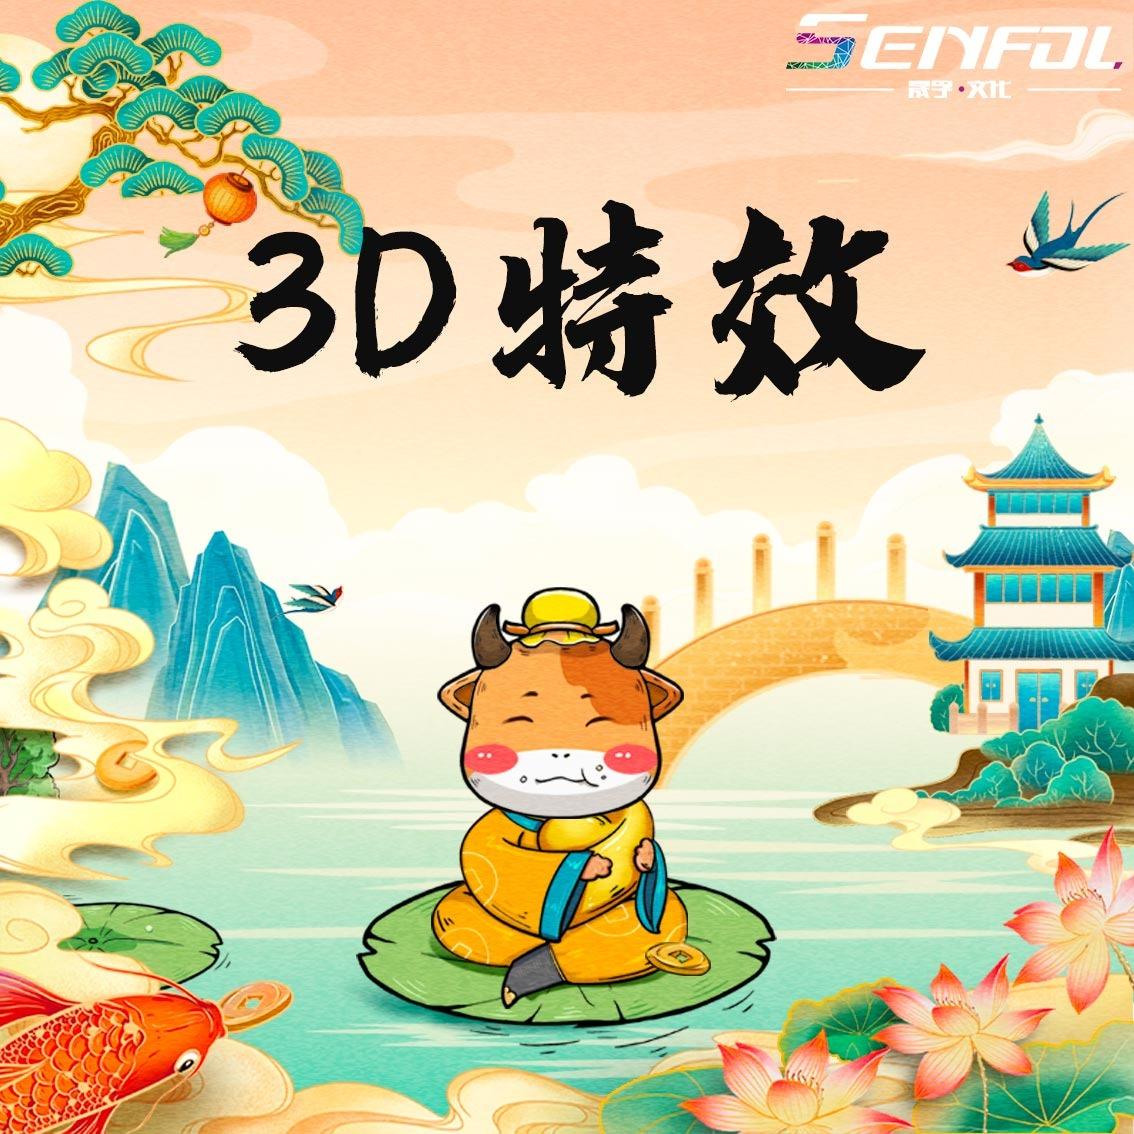 3D特效三维特效光纤穿梭爆破流体动画制作影视广告特效制作